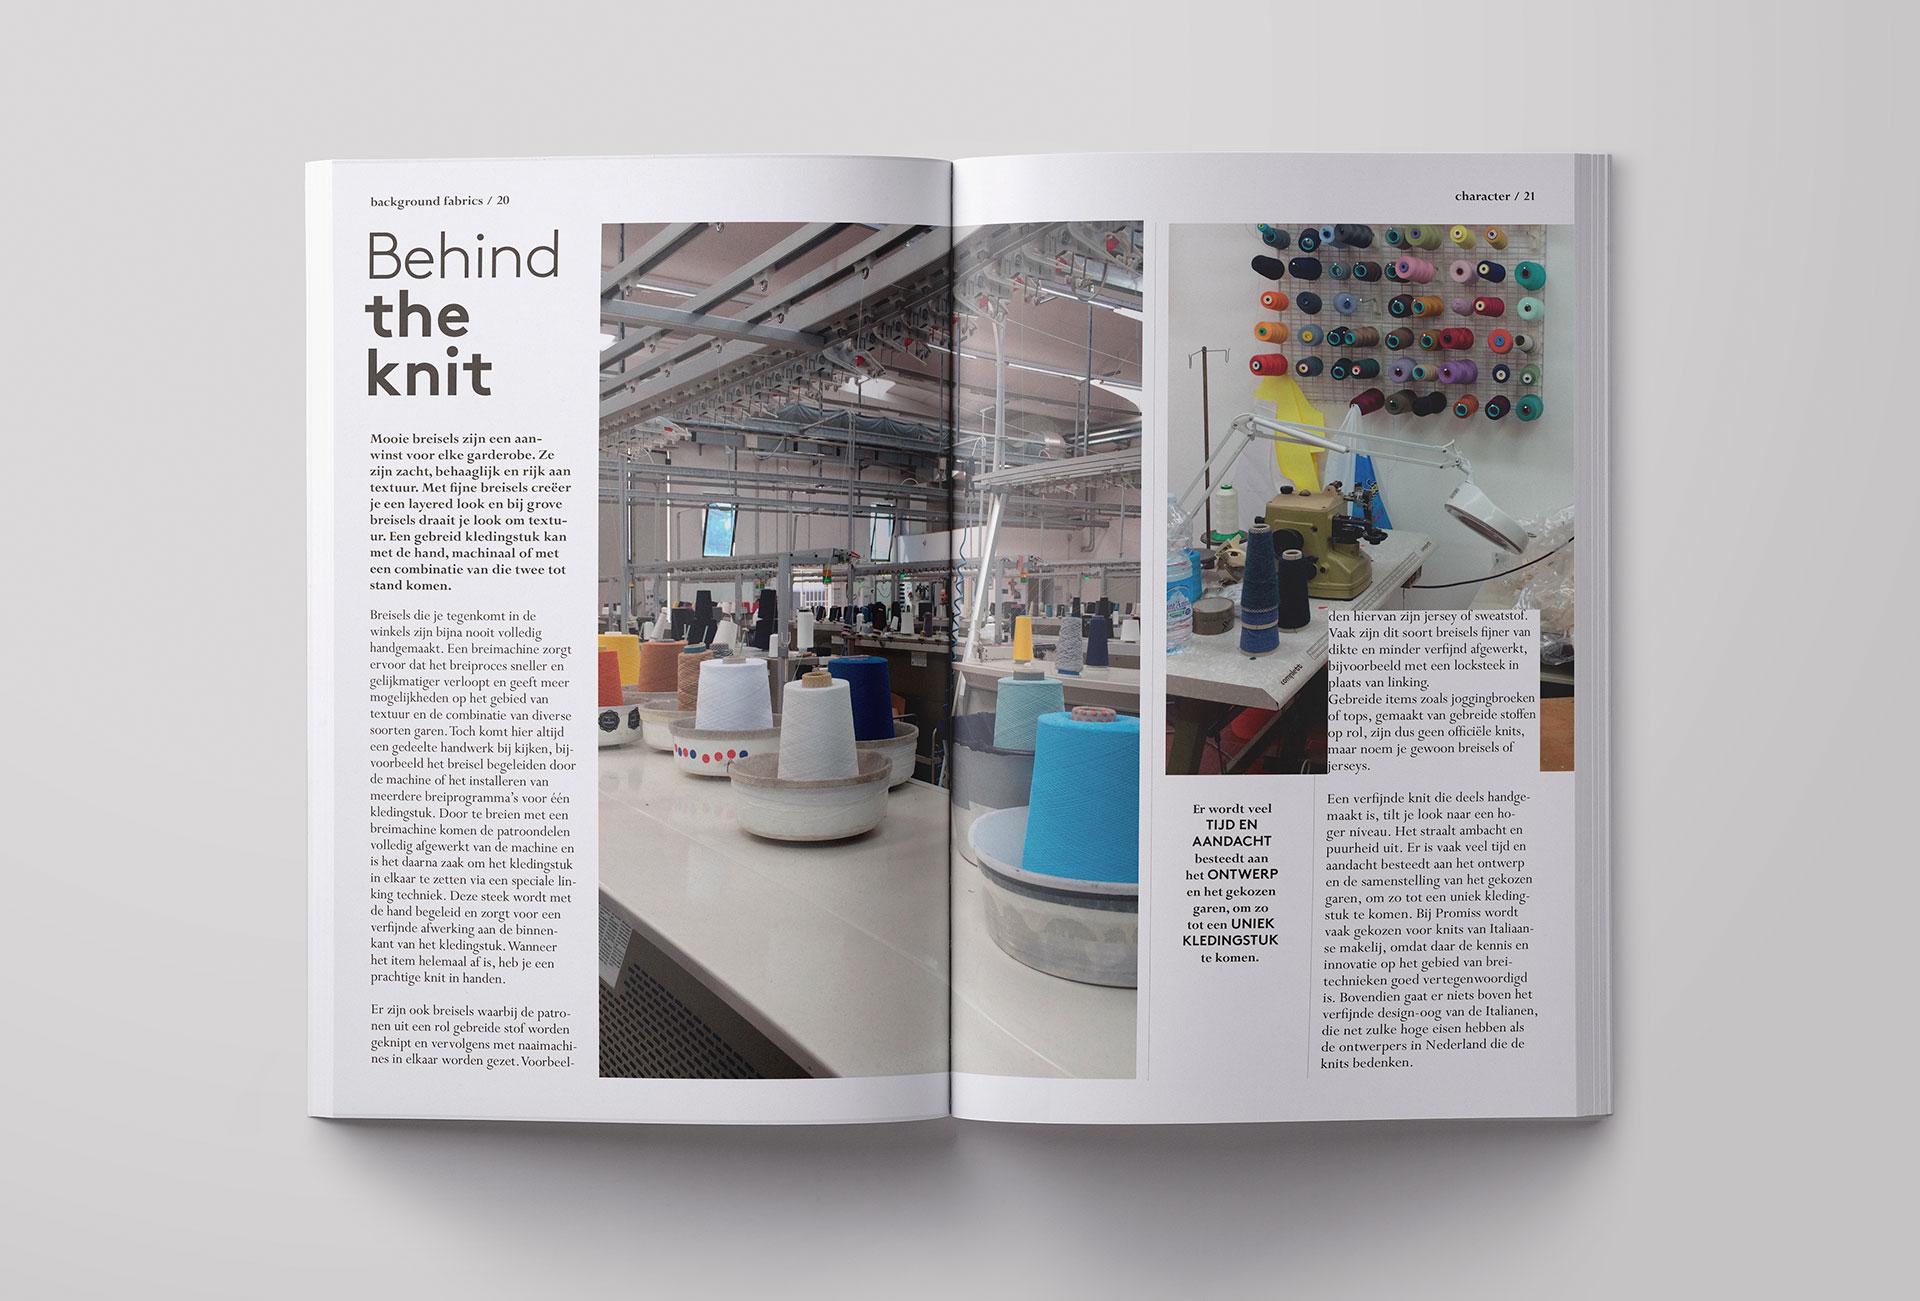 branding_magazine_design_tamarapruis_2